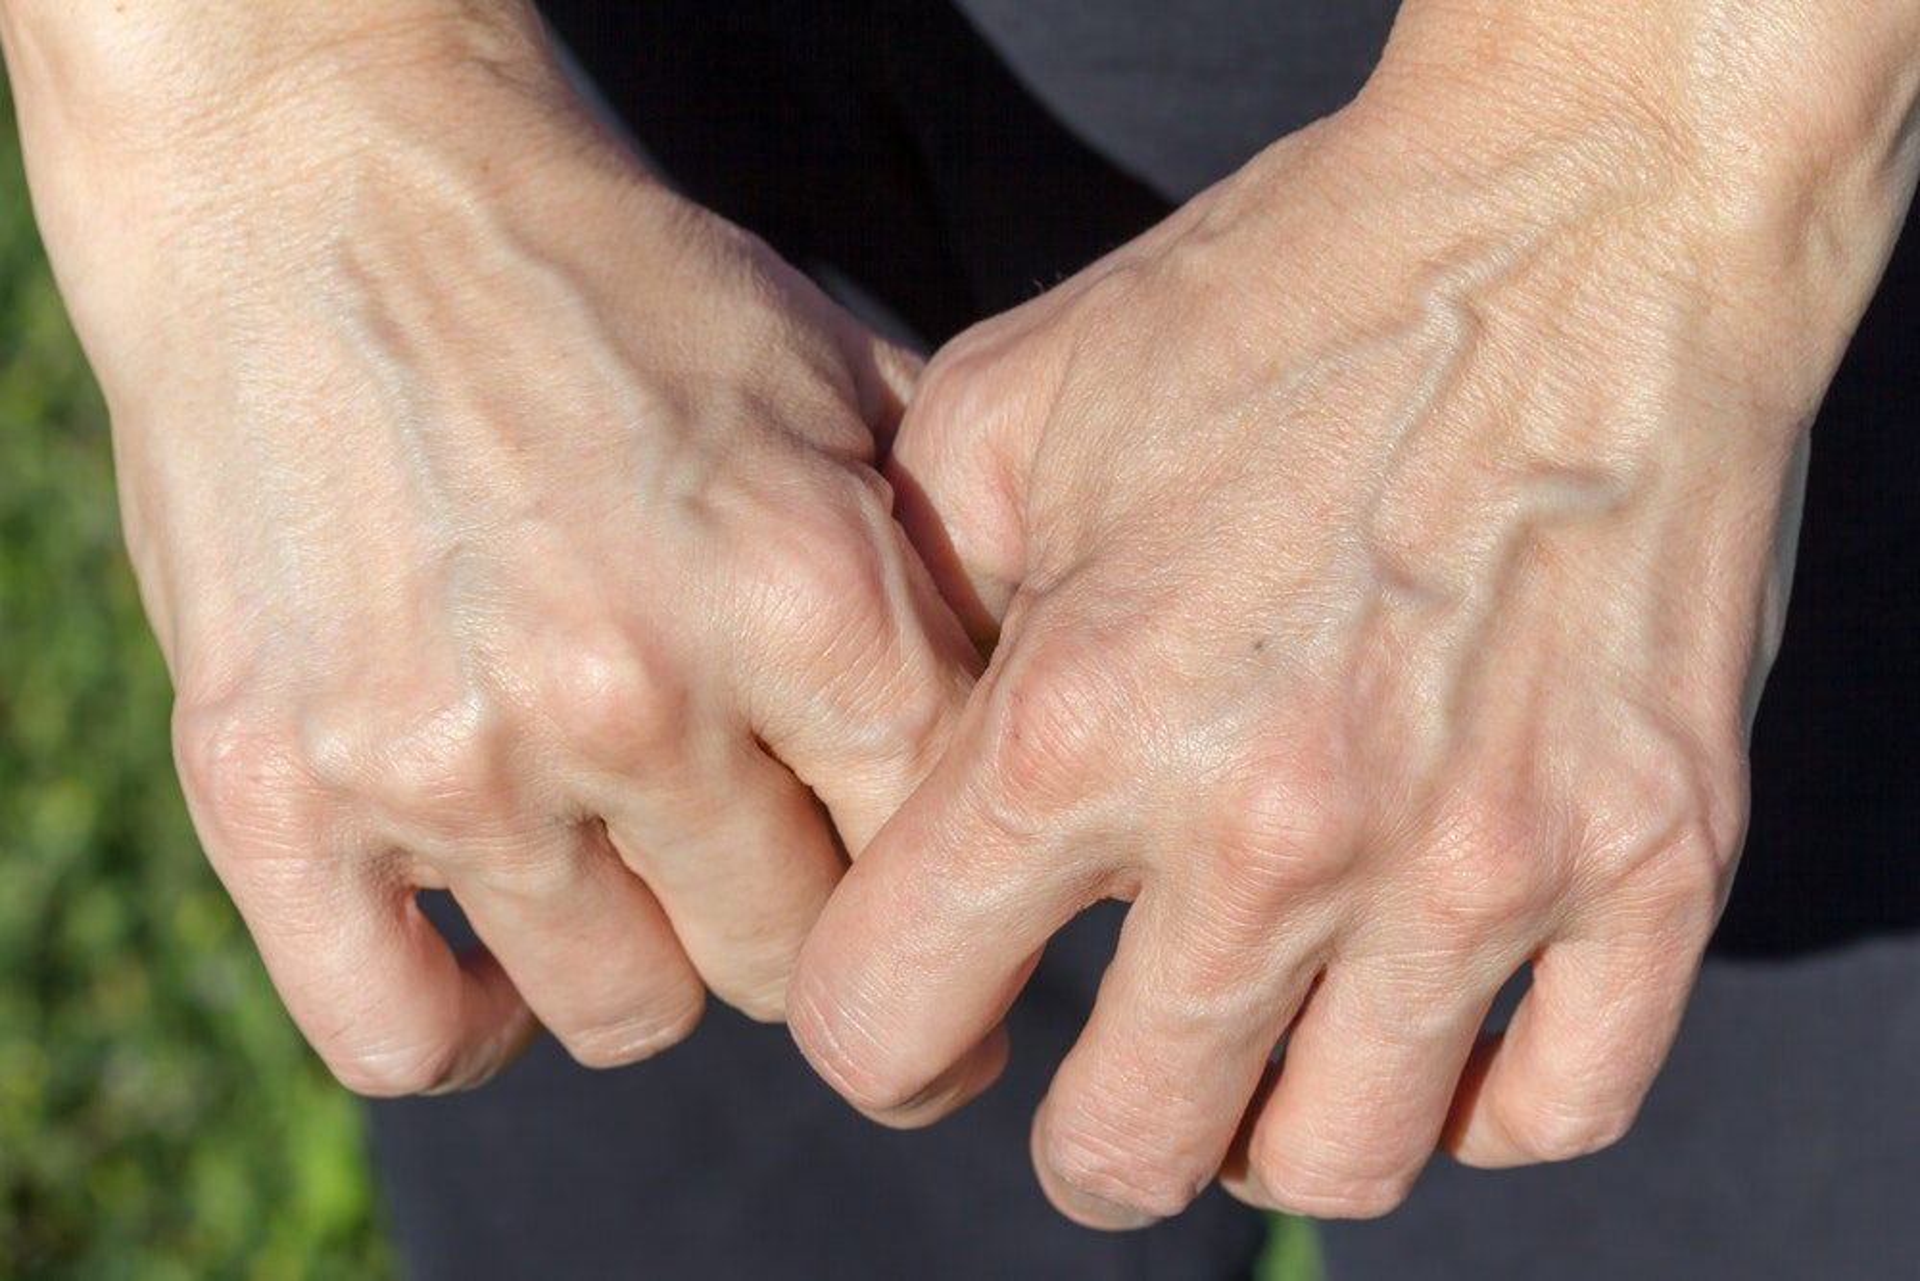 blue blood vessels in hands